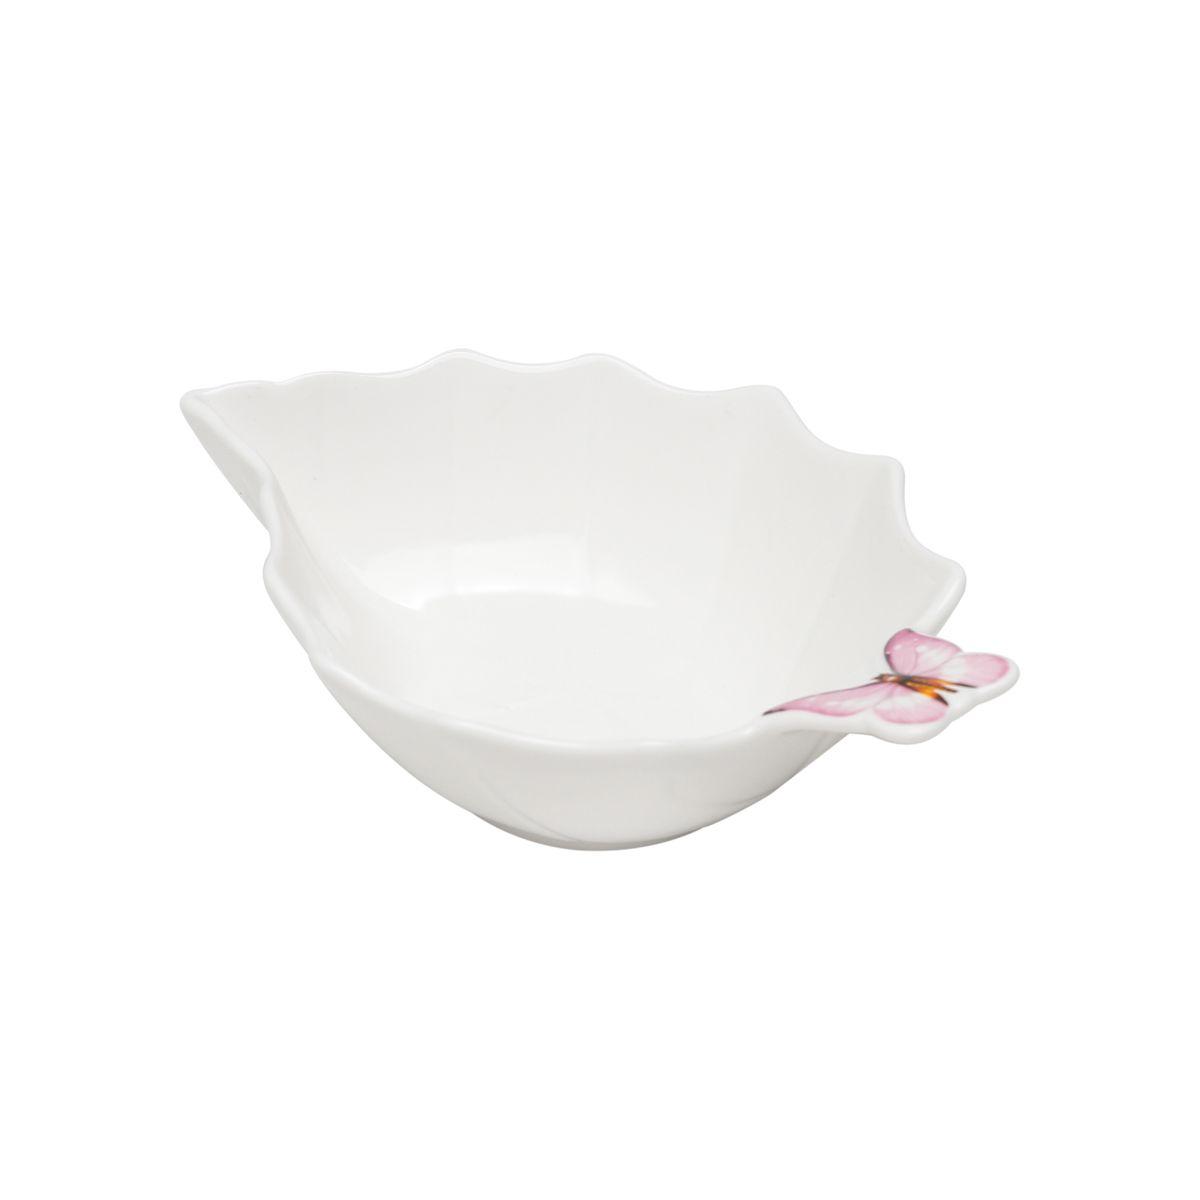 Bowl de Borboleta Rosa de Porcelana 18cm Wolff